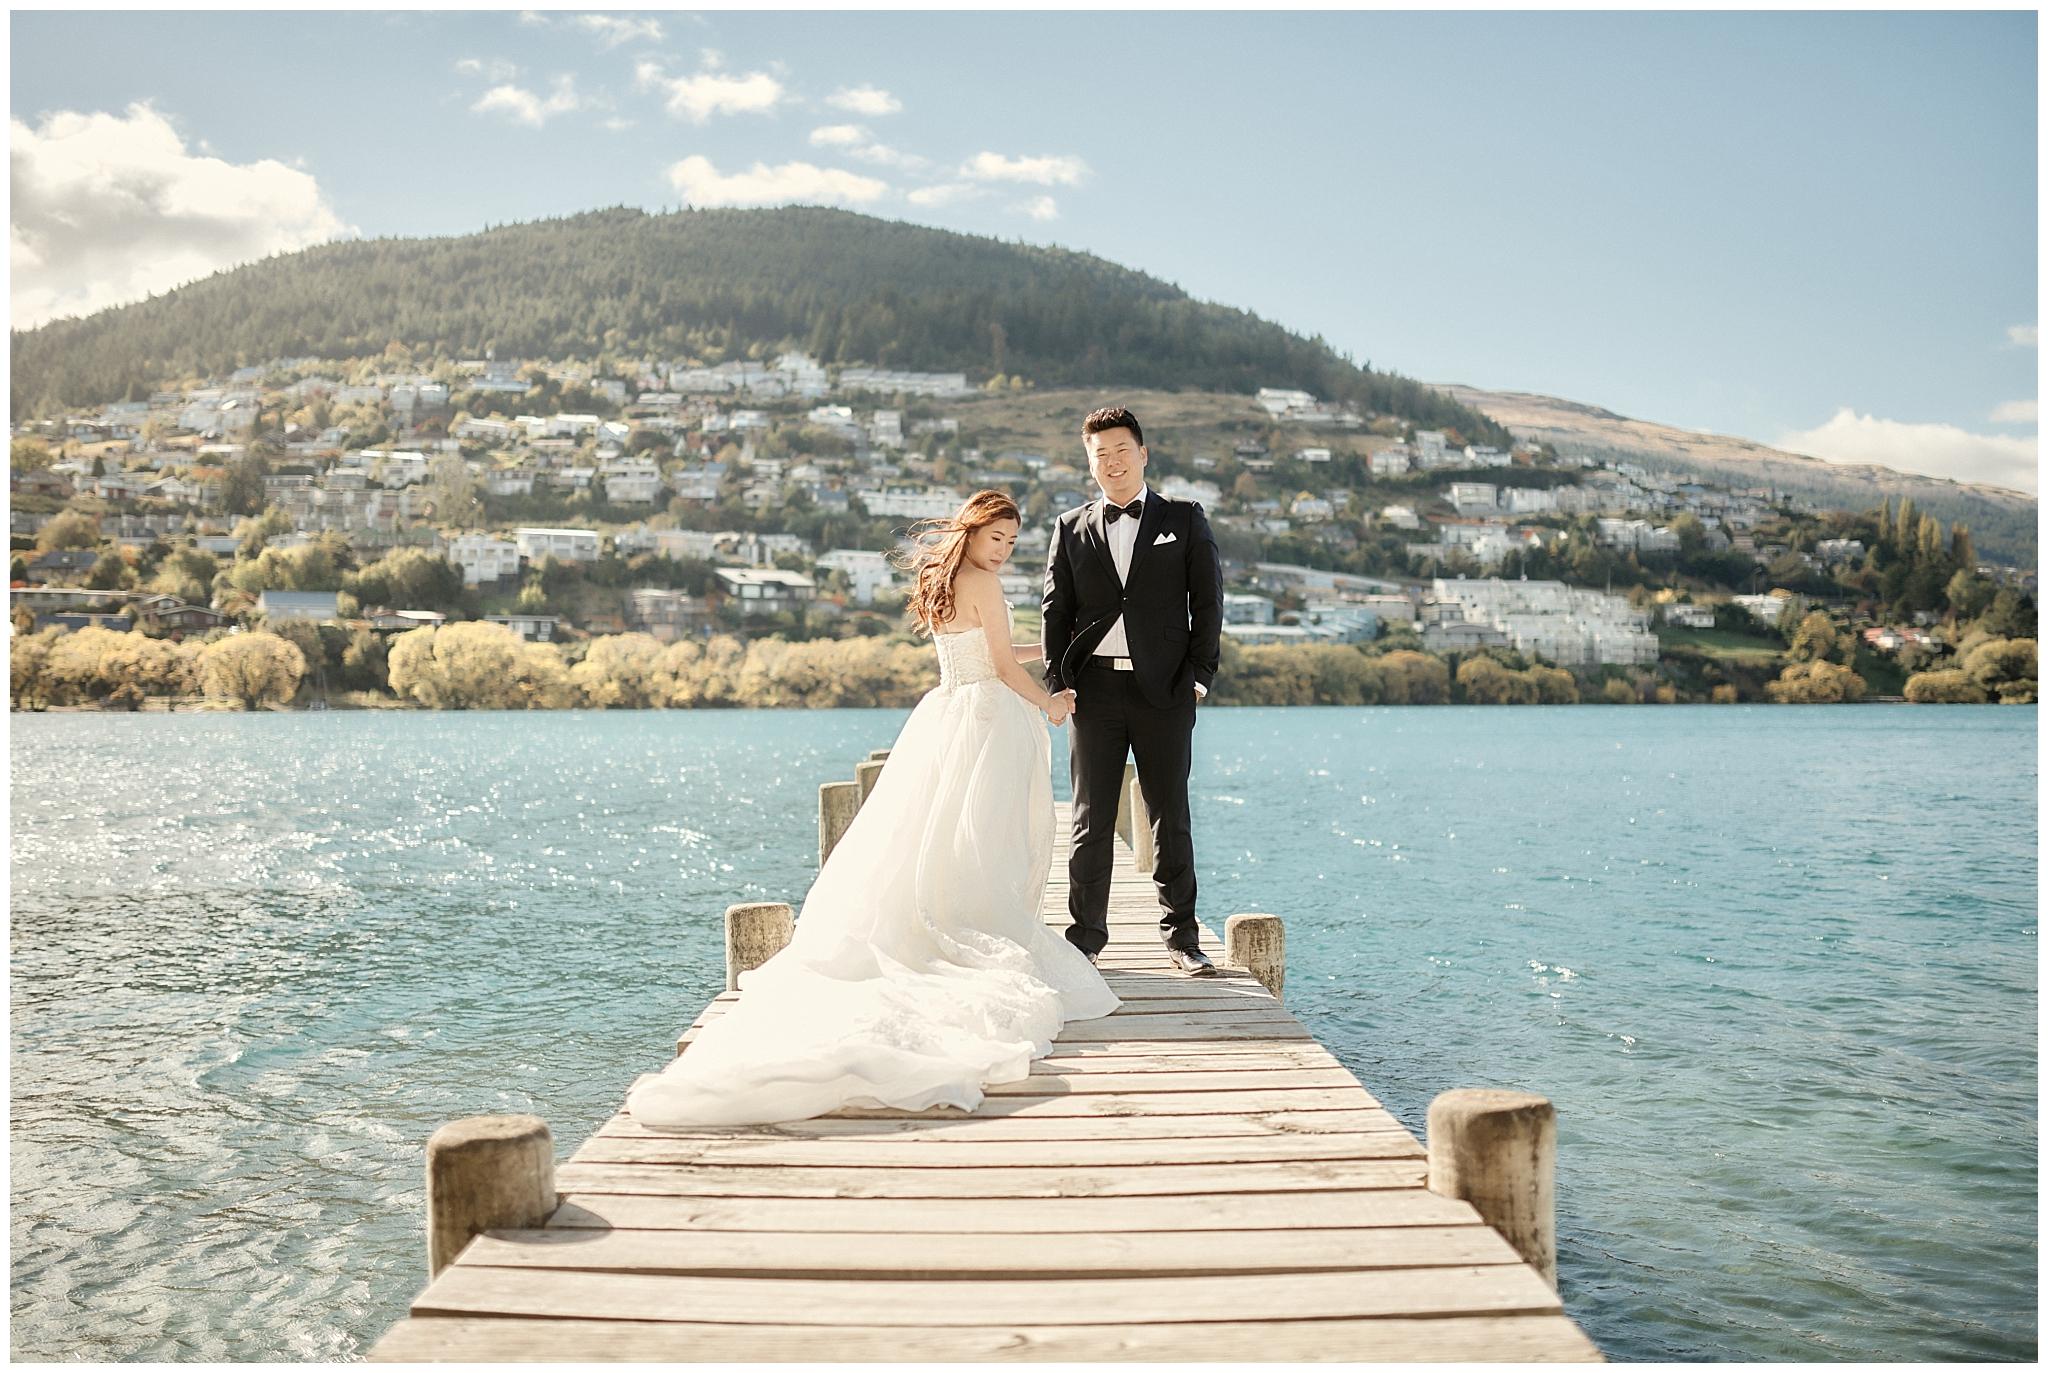 Queenstown Tekapo New Zealand Prewedding Wedding Photographer  ニュージーランド クイーンズタウン テカポ ウェディング 前撮り フォト